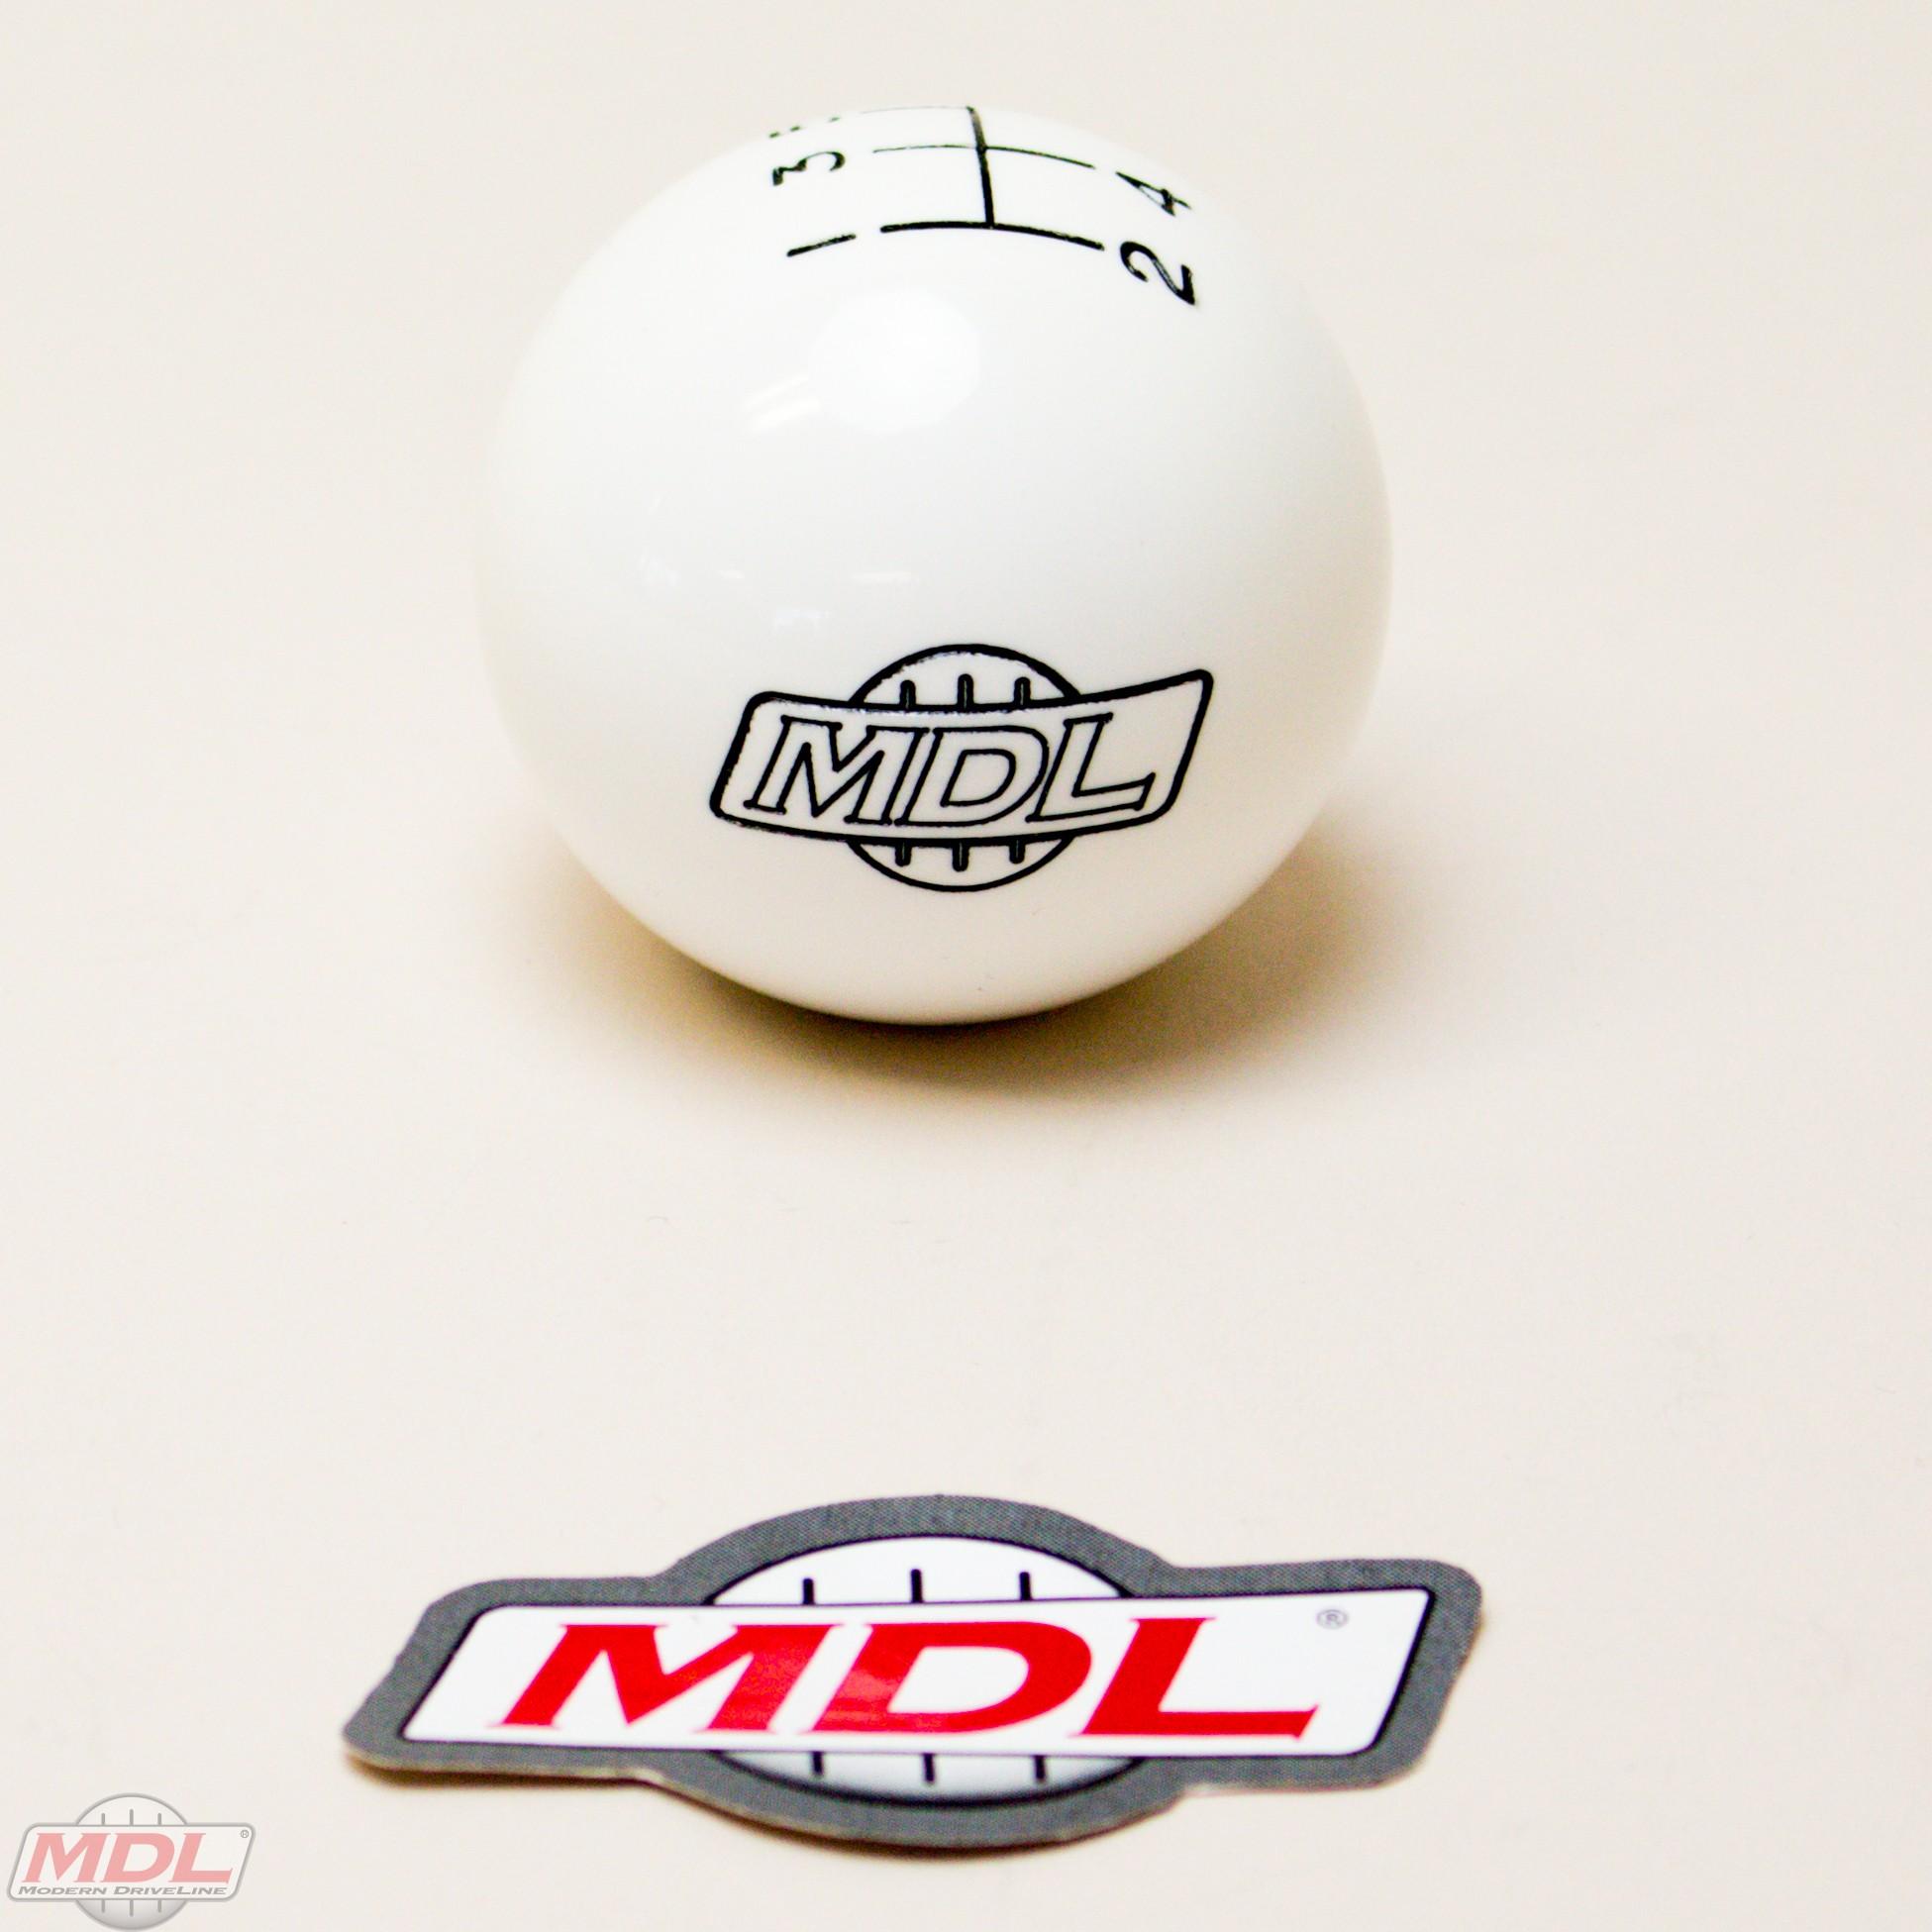 RASNONE Shift Knob Manual Gear Shift Lever Round Ball 8 Ball ...